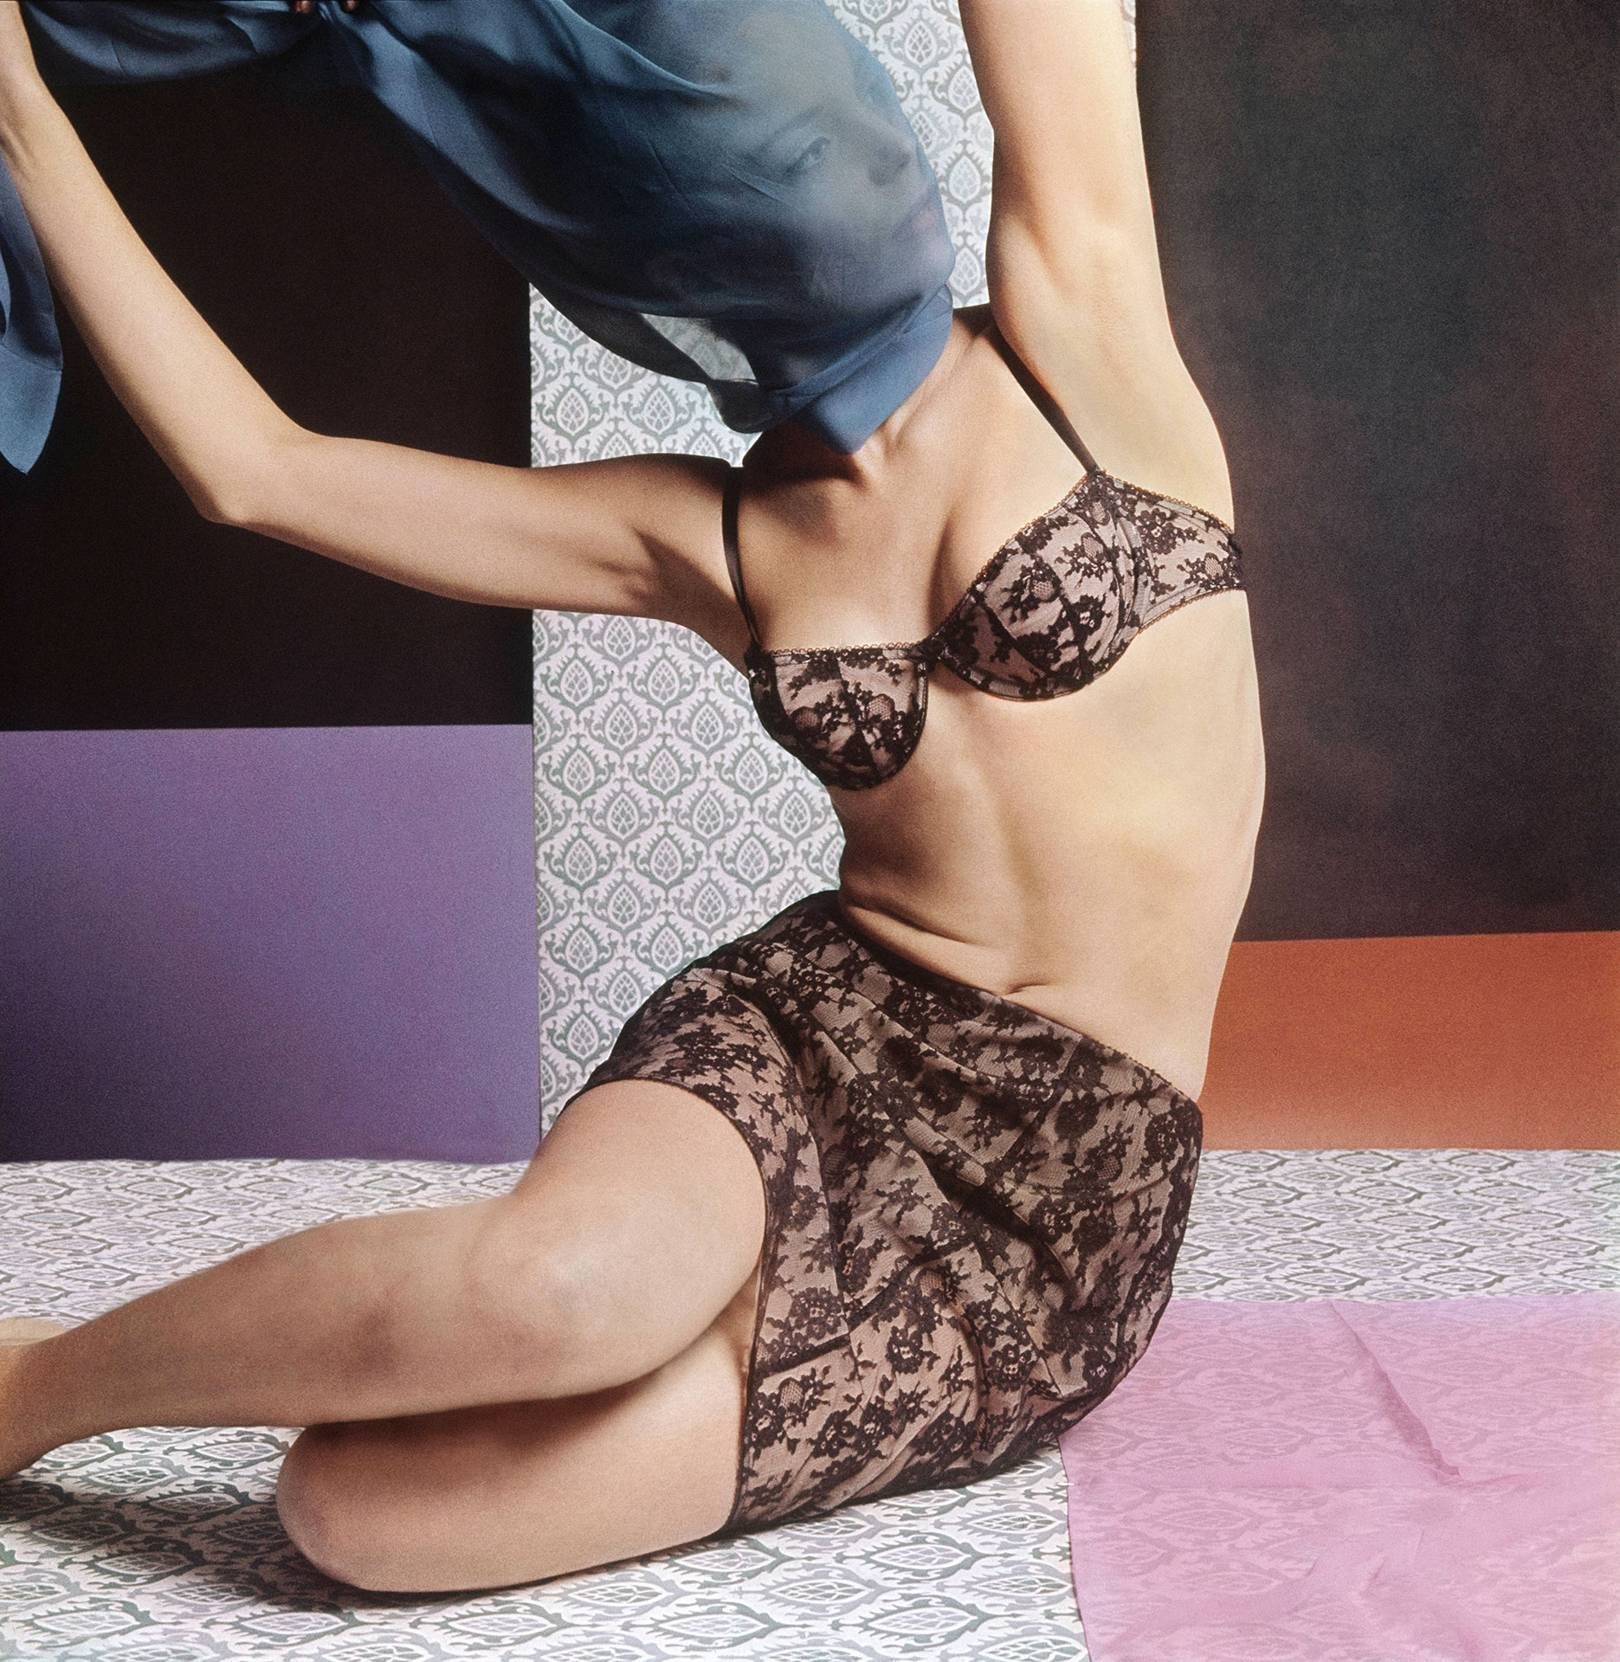 871d39dca Lingerie Drawer Spring Clean - Essential Underwear